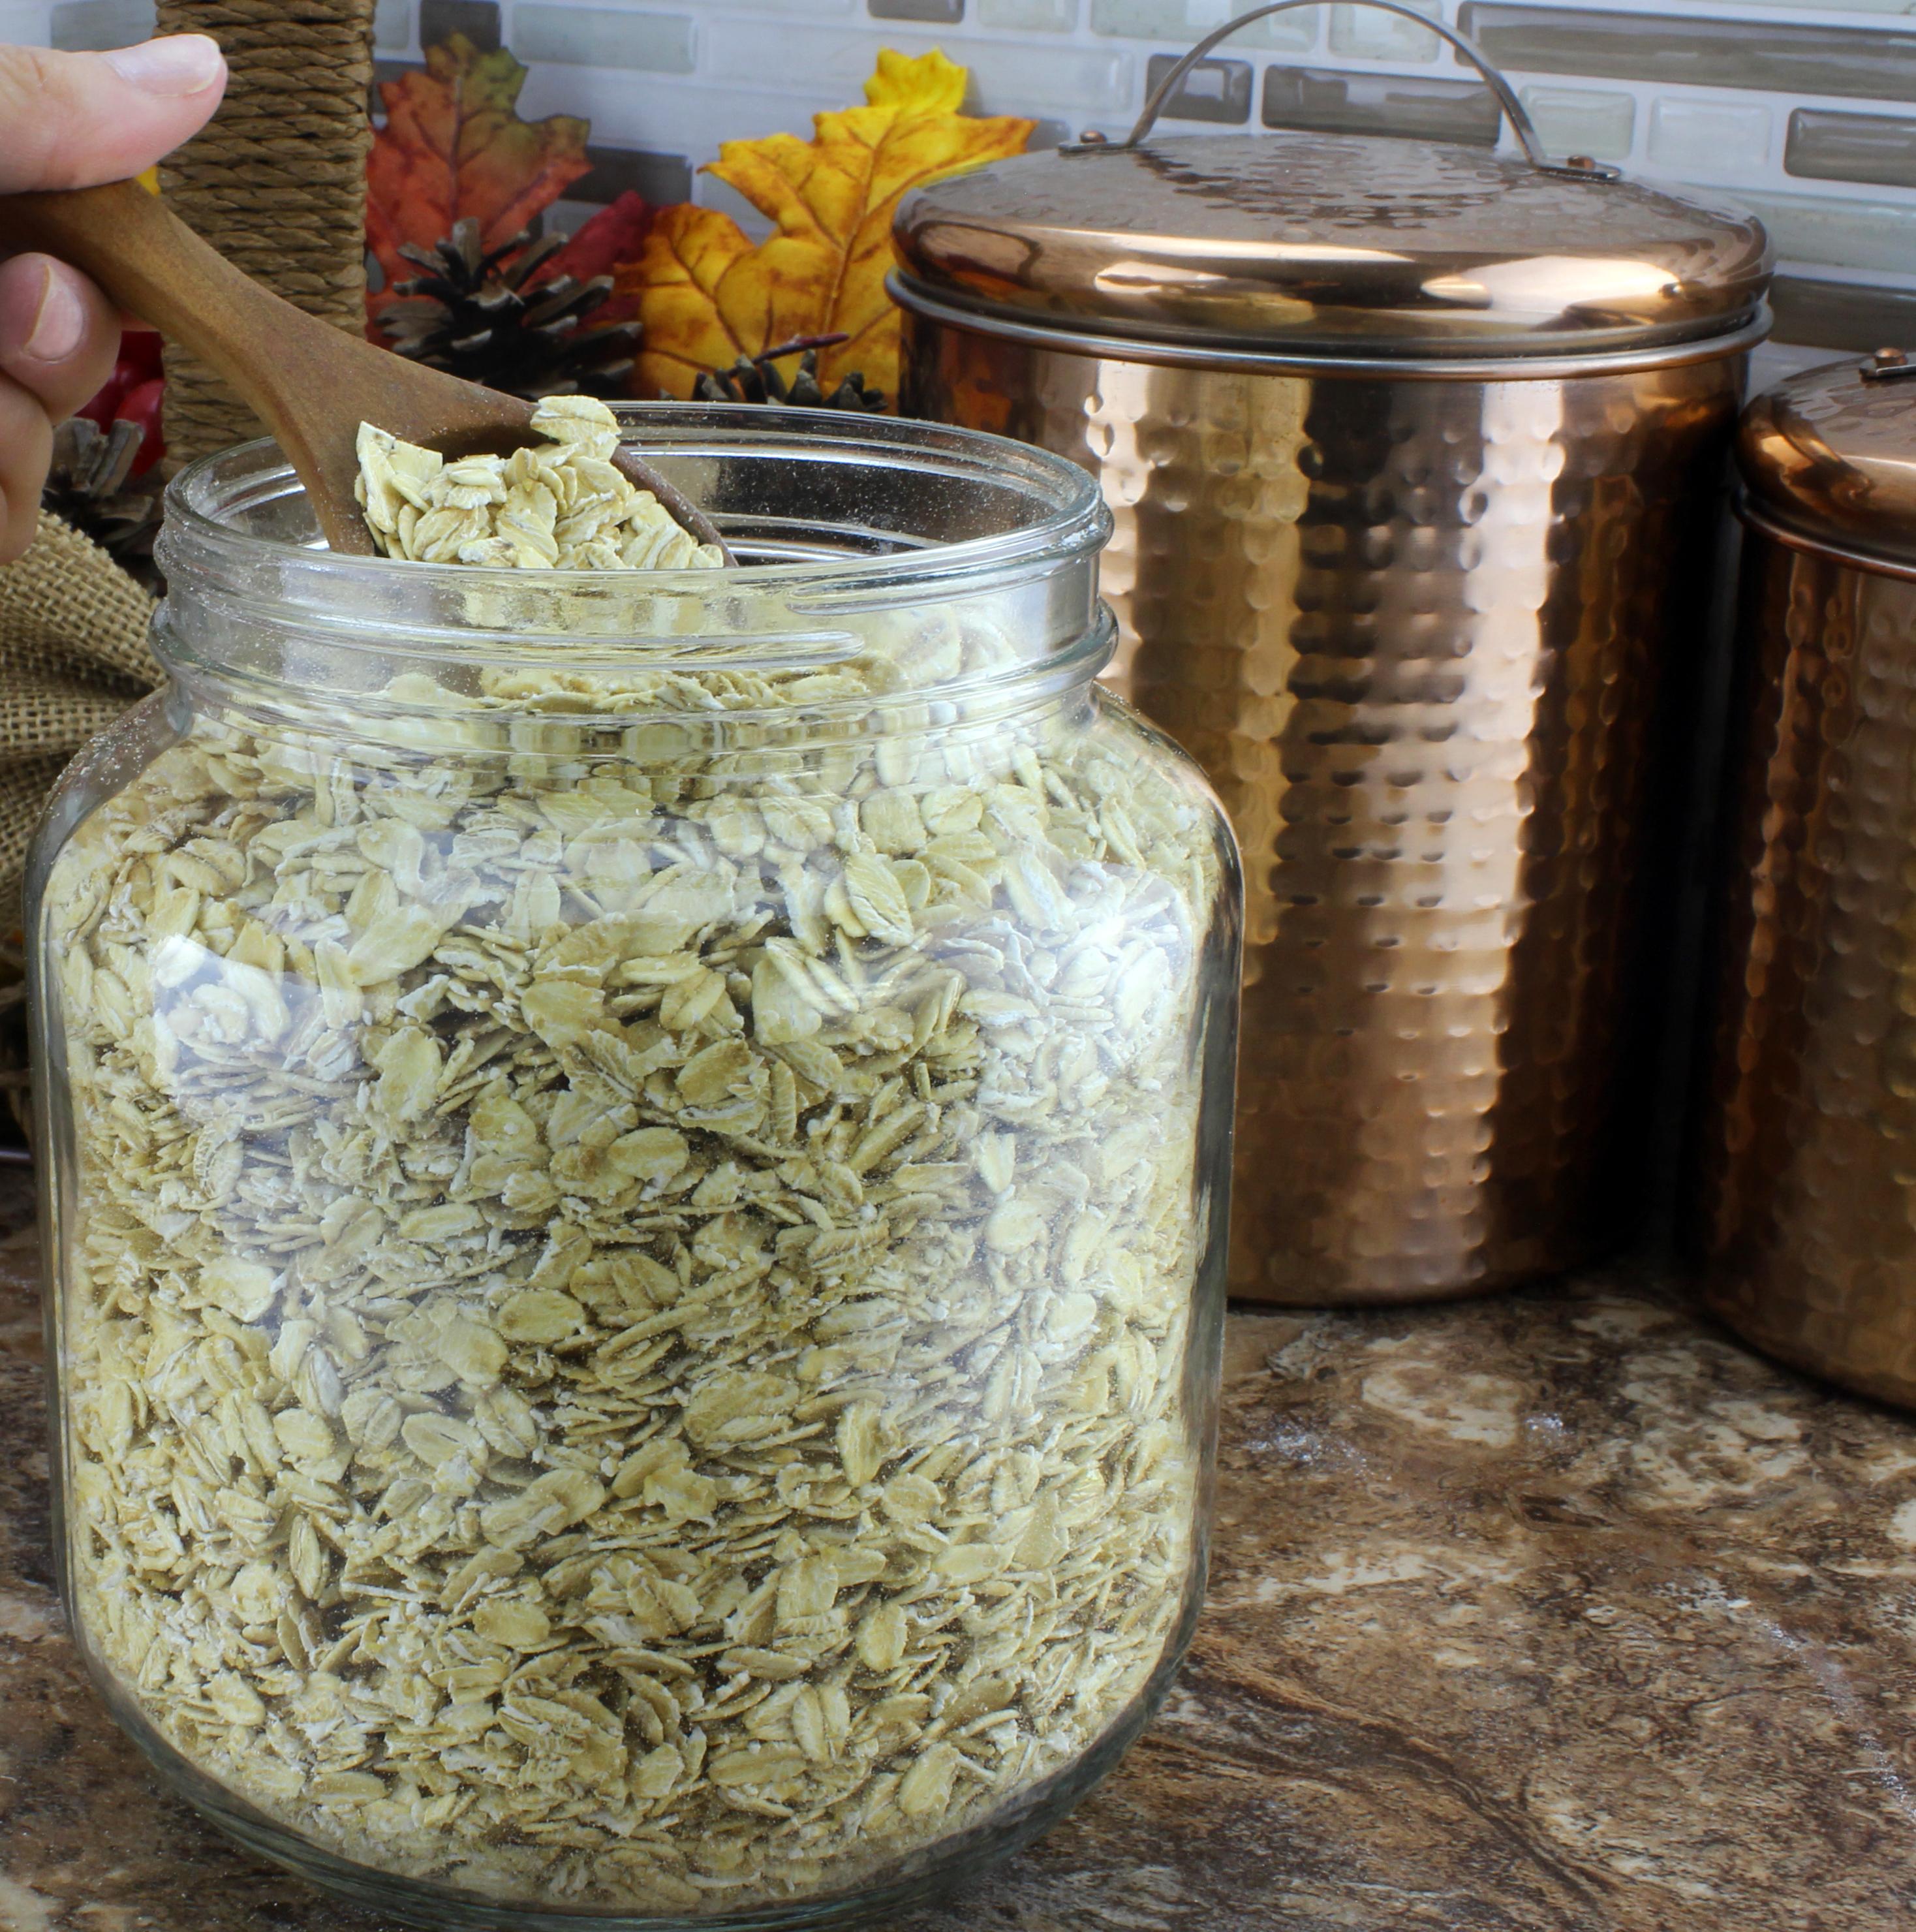 B01FMVSXHS - 64oz Clear Wide-mouth Glass Jar, BPA free Food Grade w White Metal Lid (Half Gallon) 6